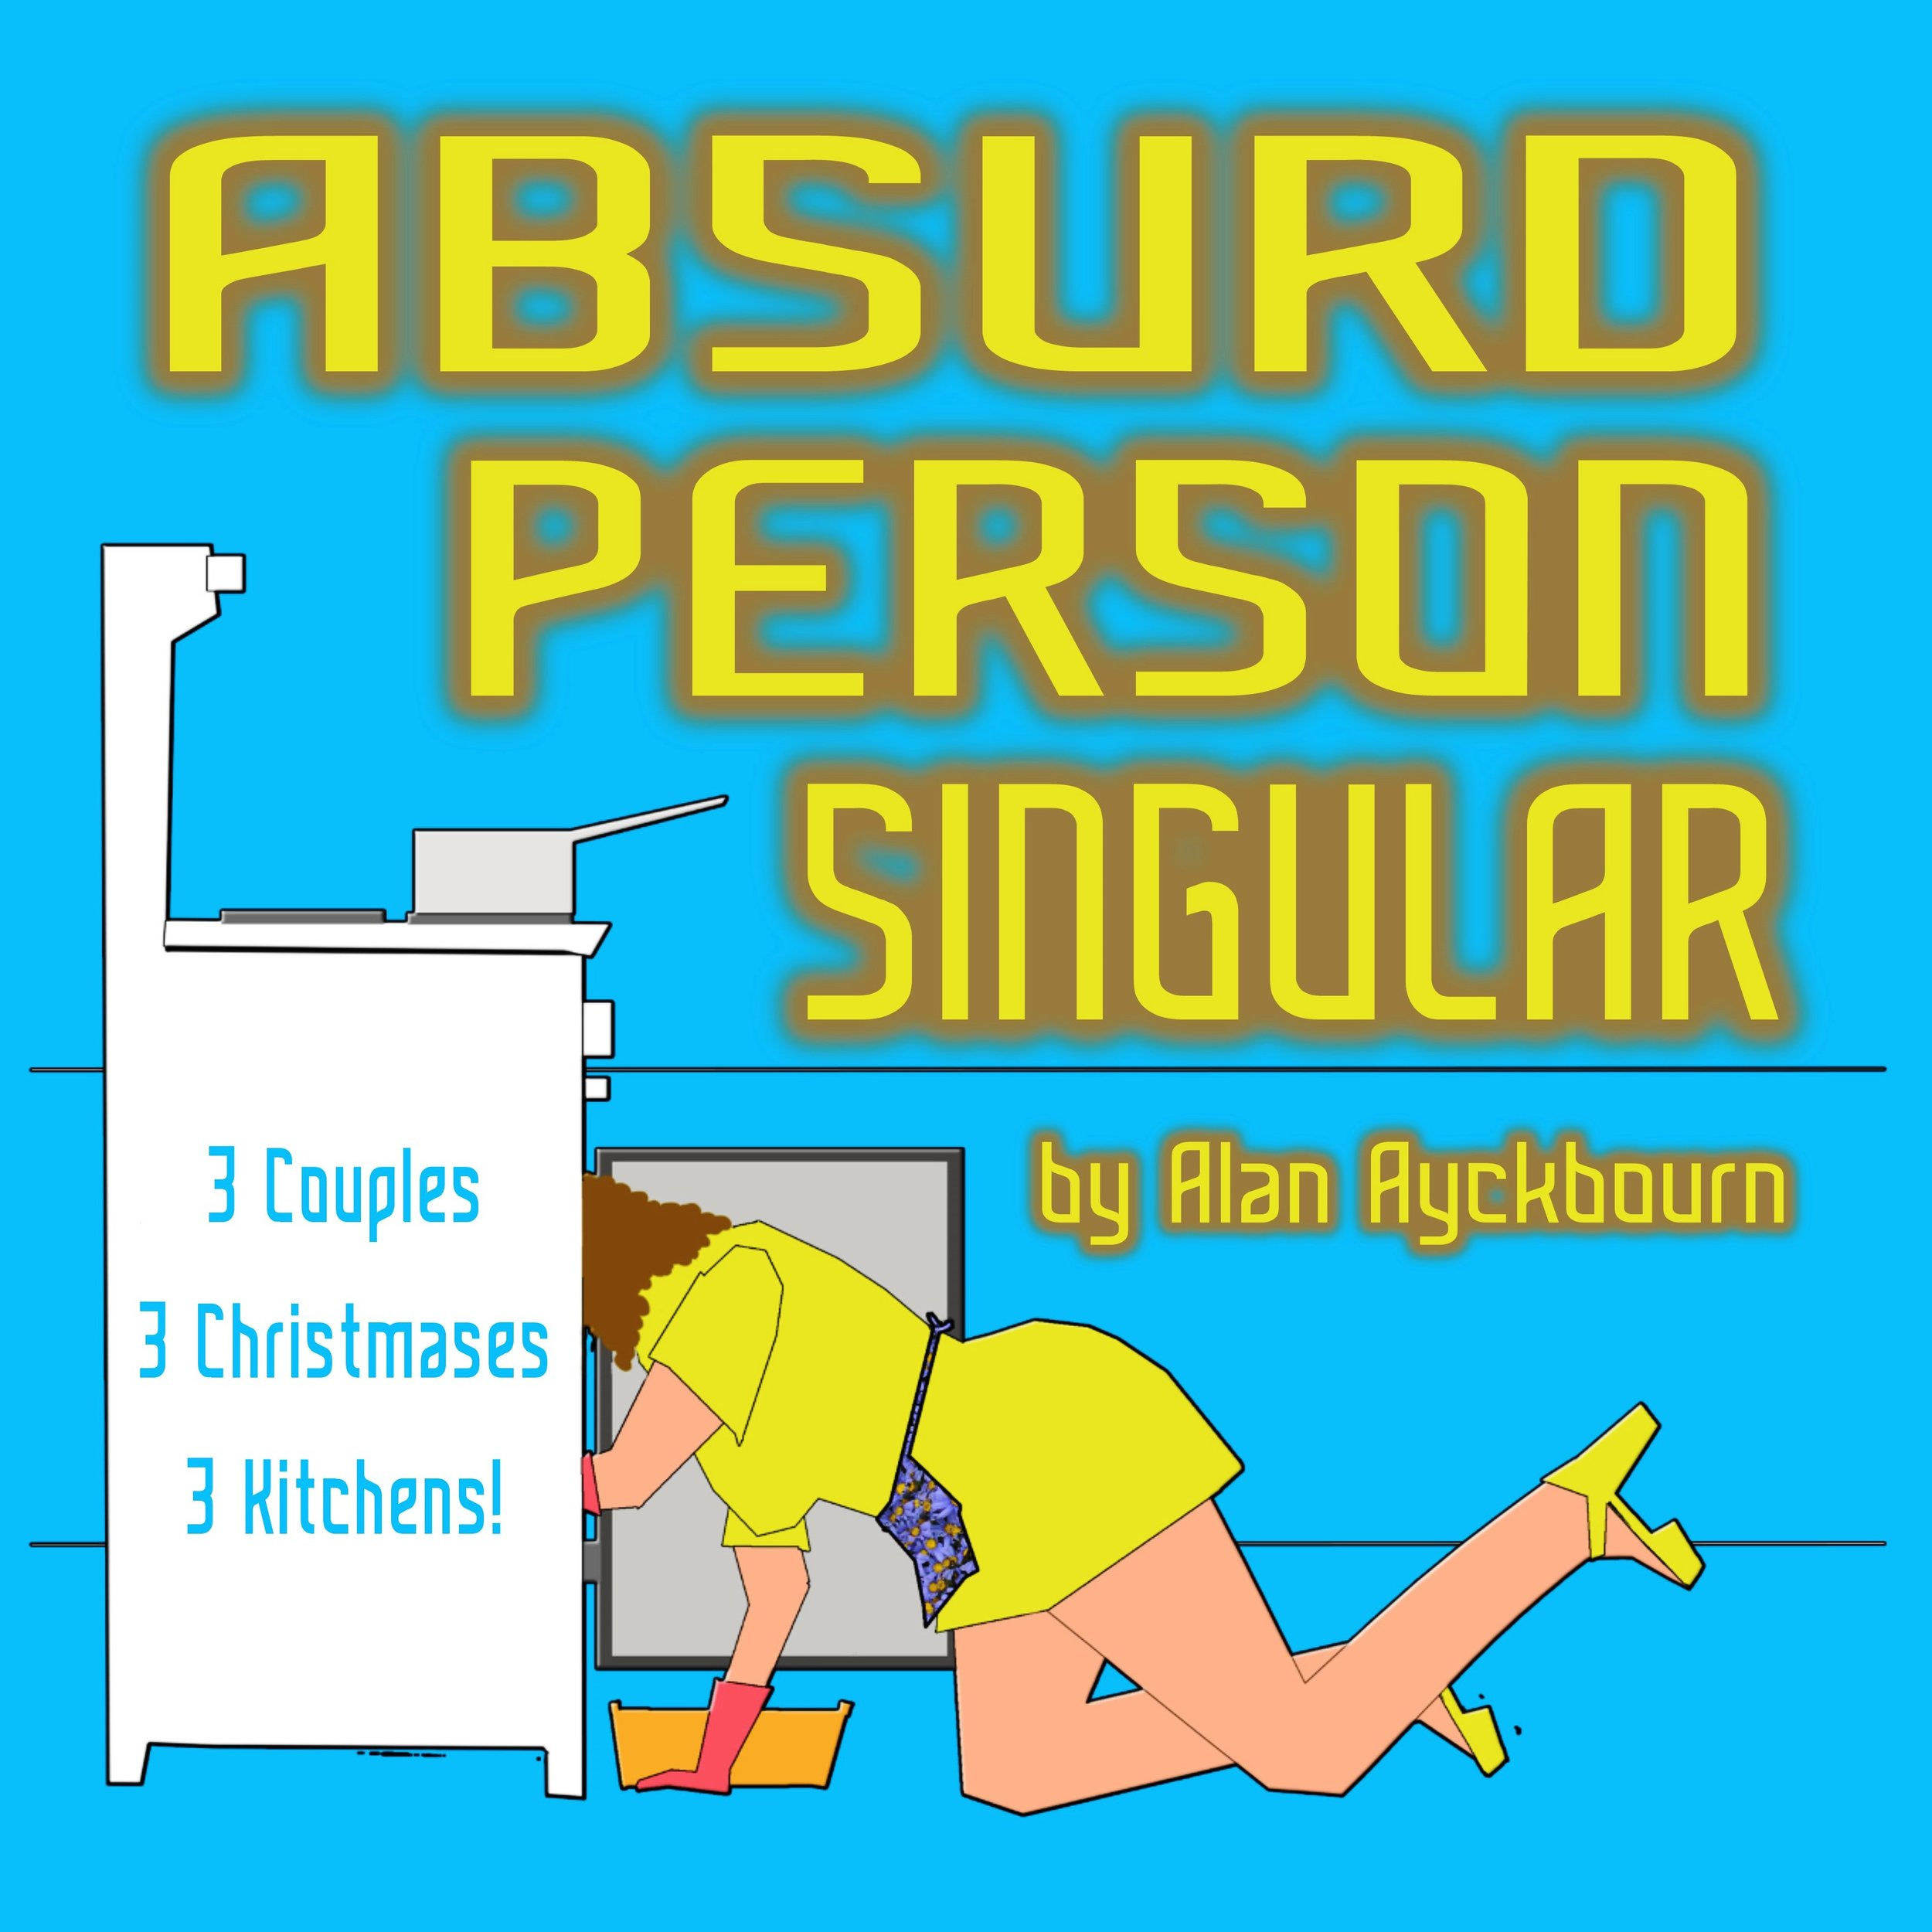 absurd person singular web image.jpg